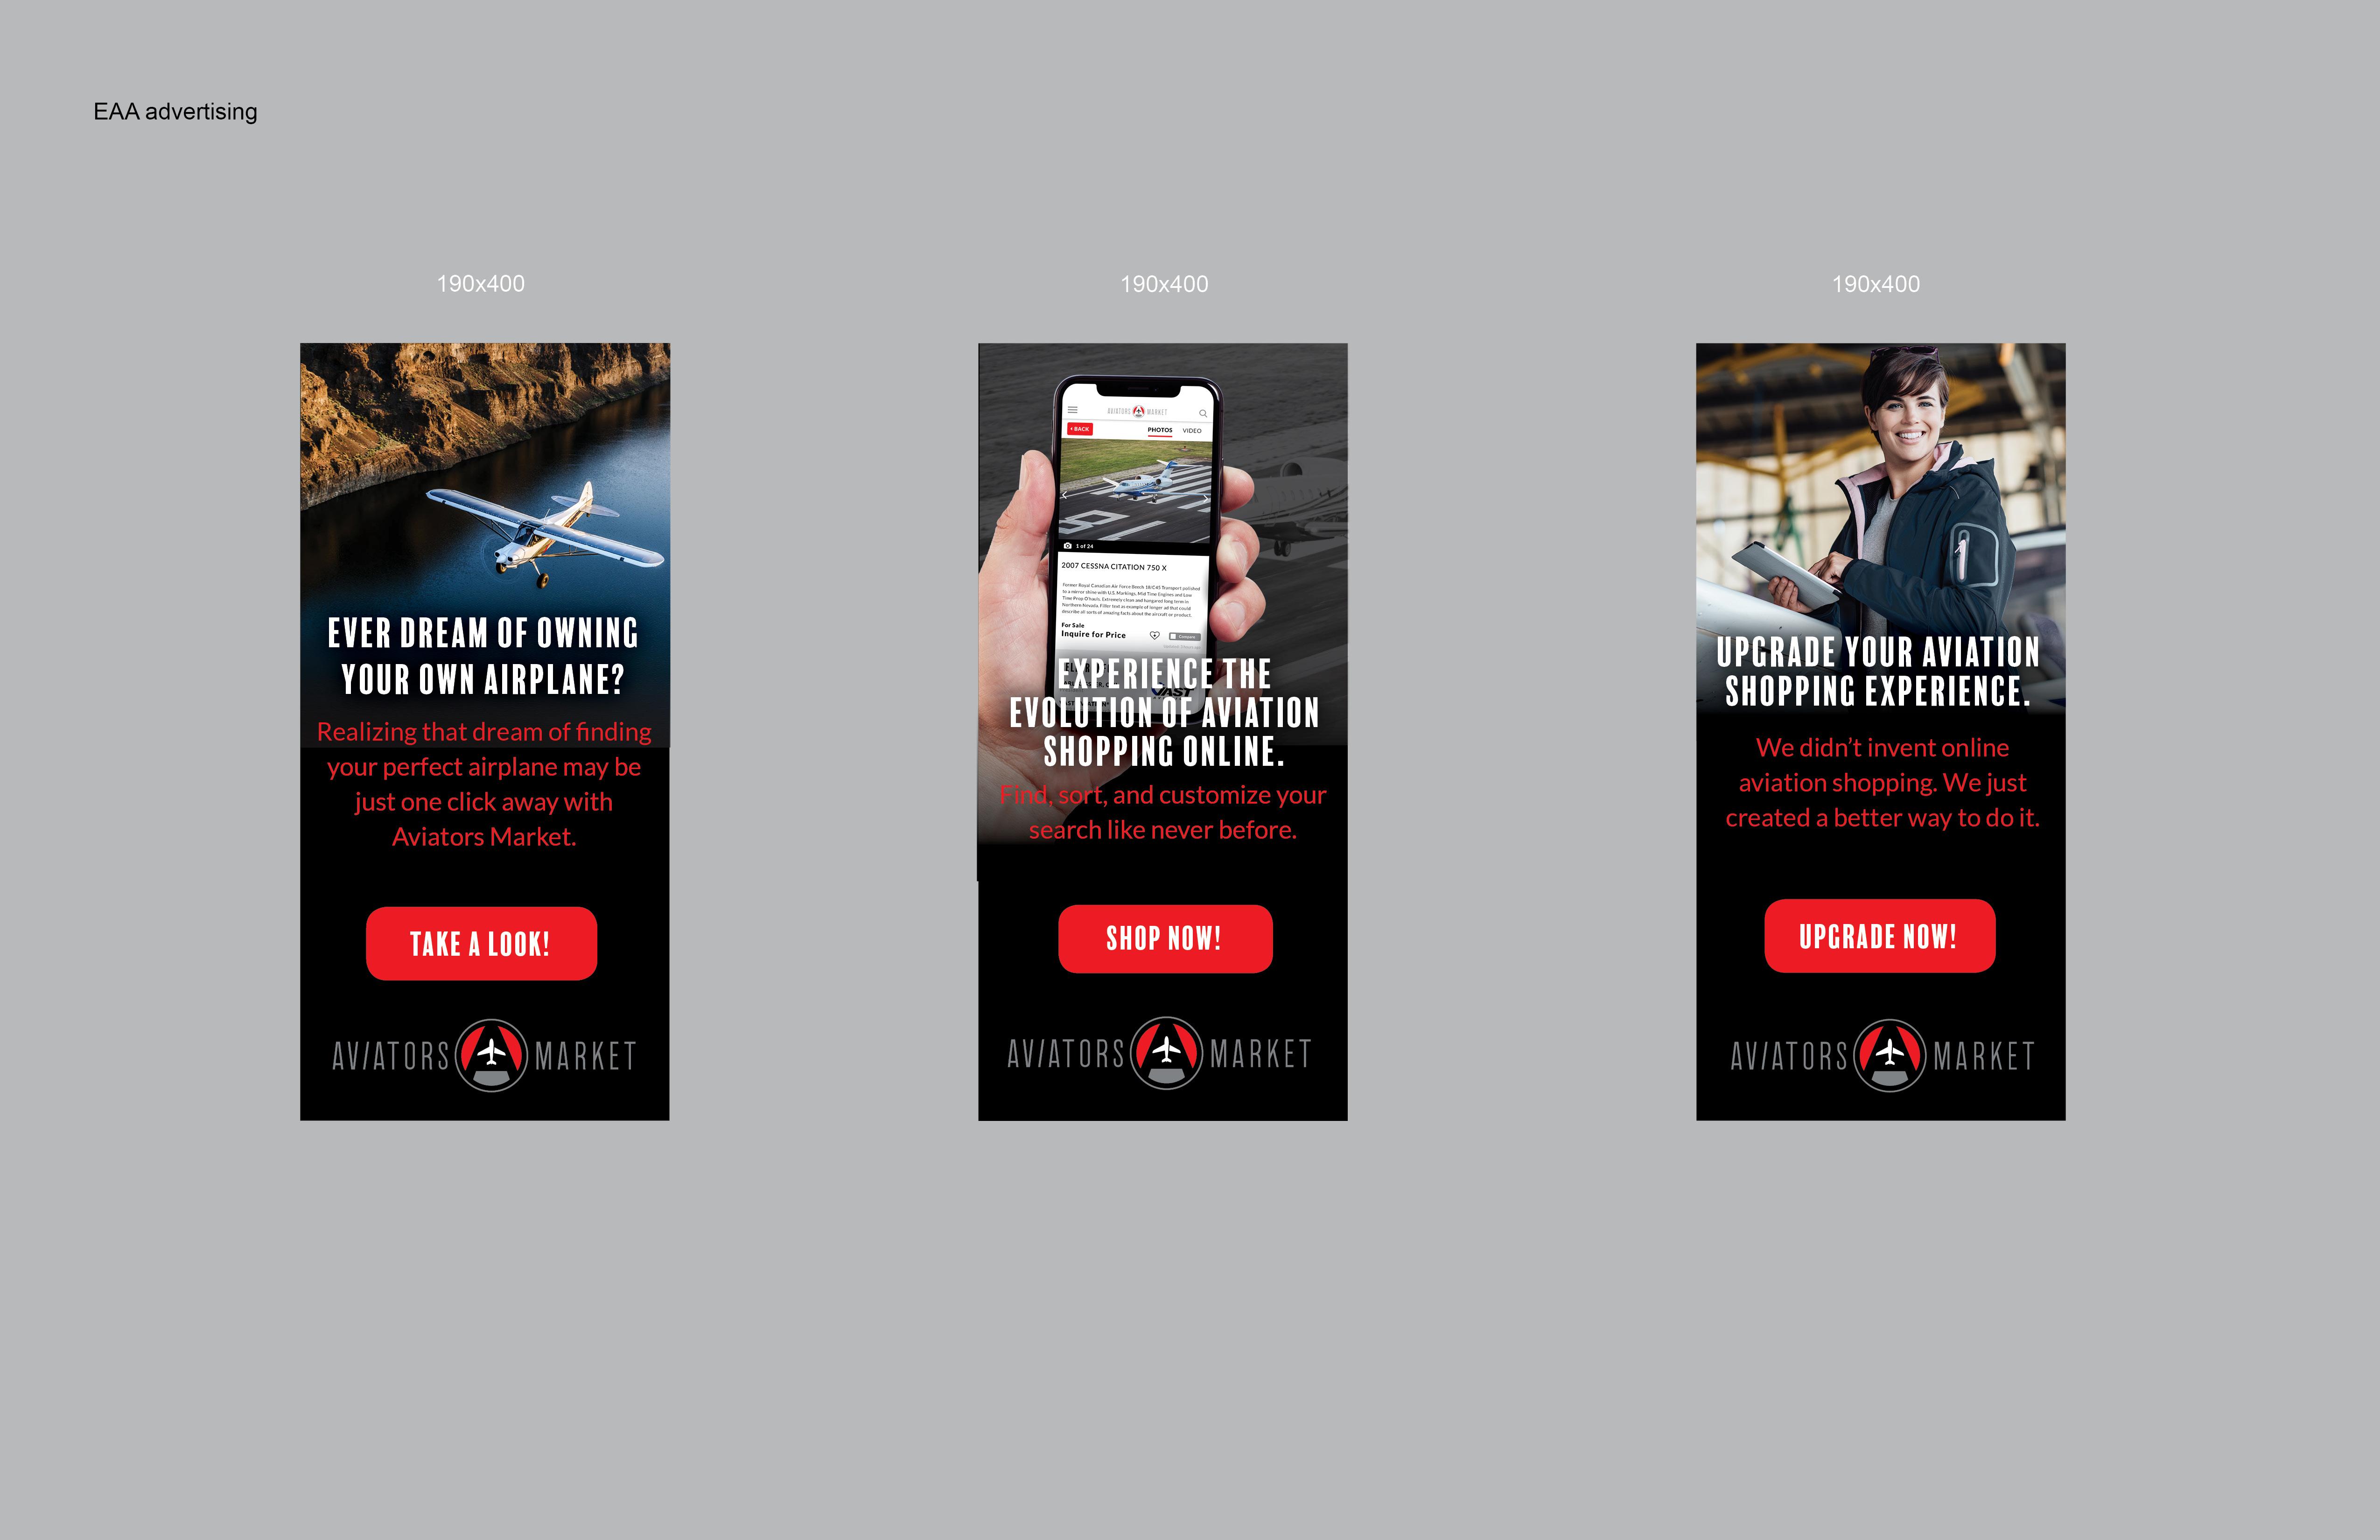 19-AM-019-4_Digital_Ad_Campaign